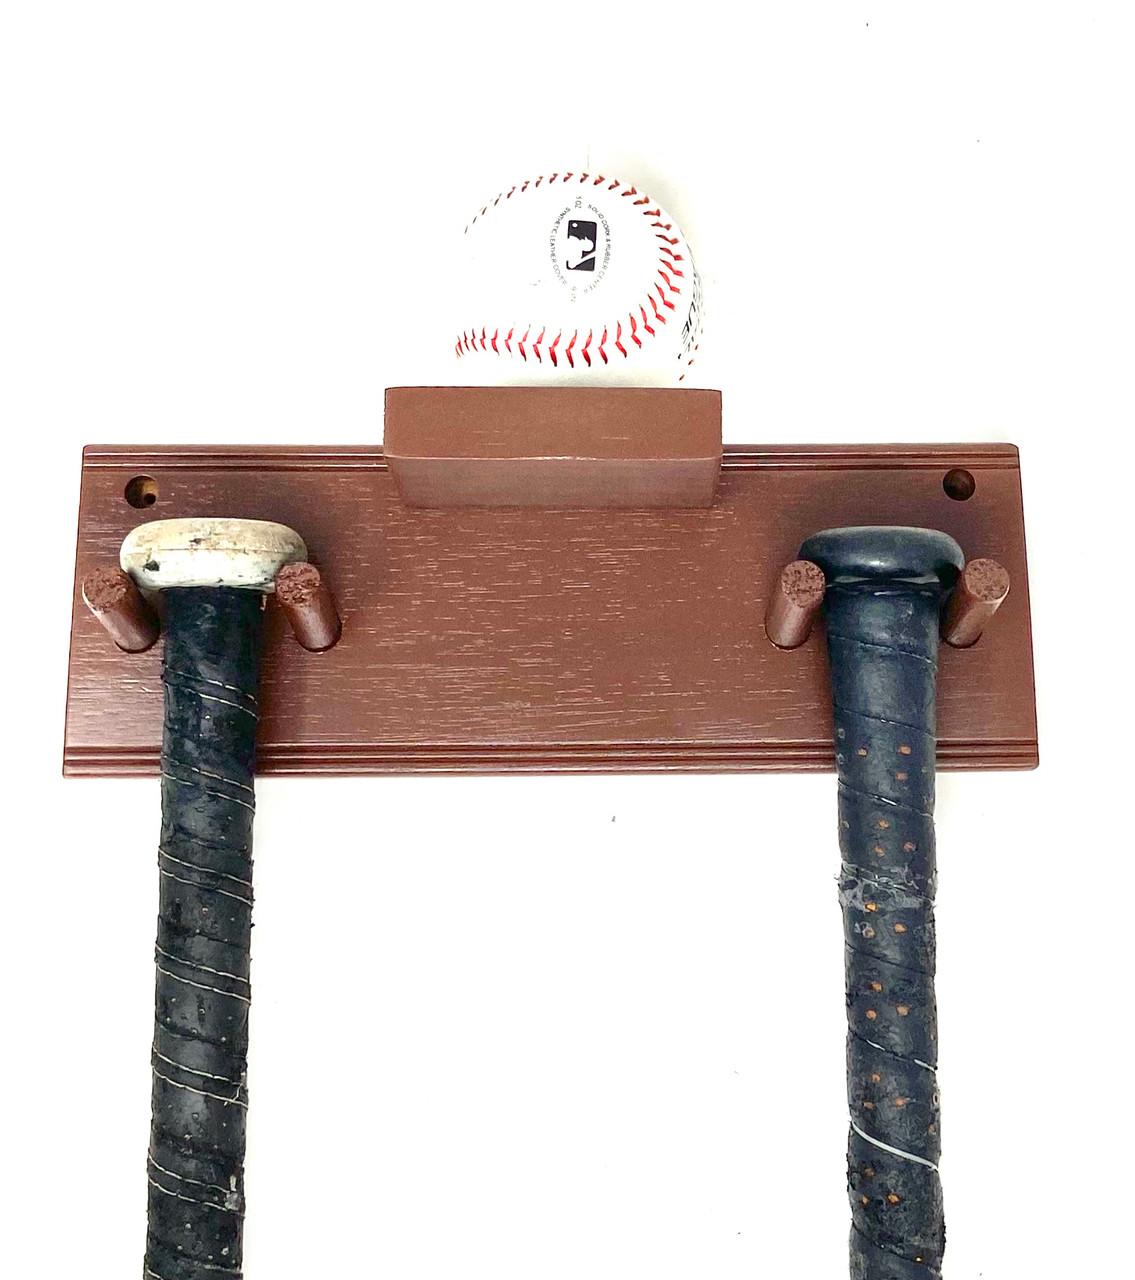 Baseball Bat Rack Display Holder Wall Mount Full Size 2 Bats 1 Ball